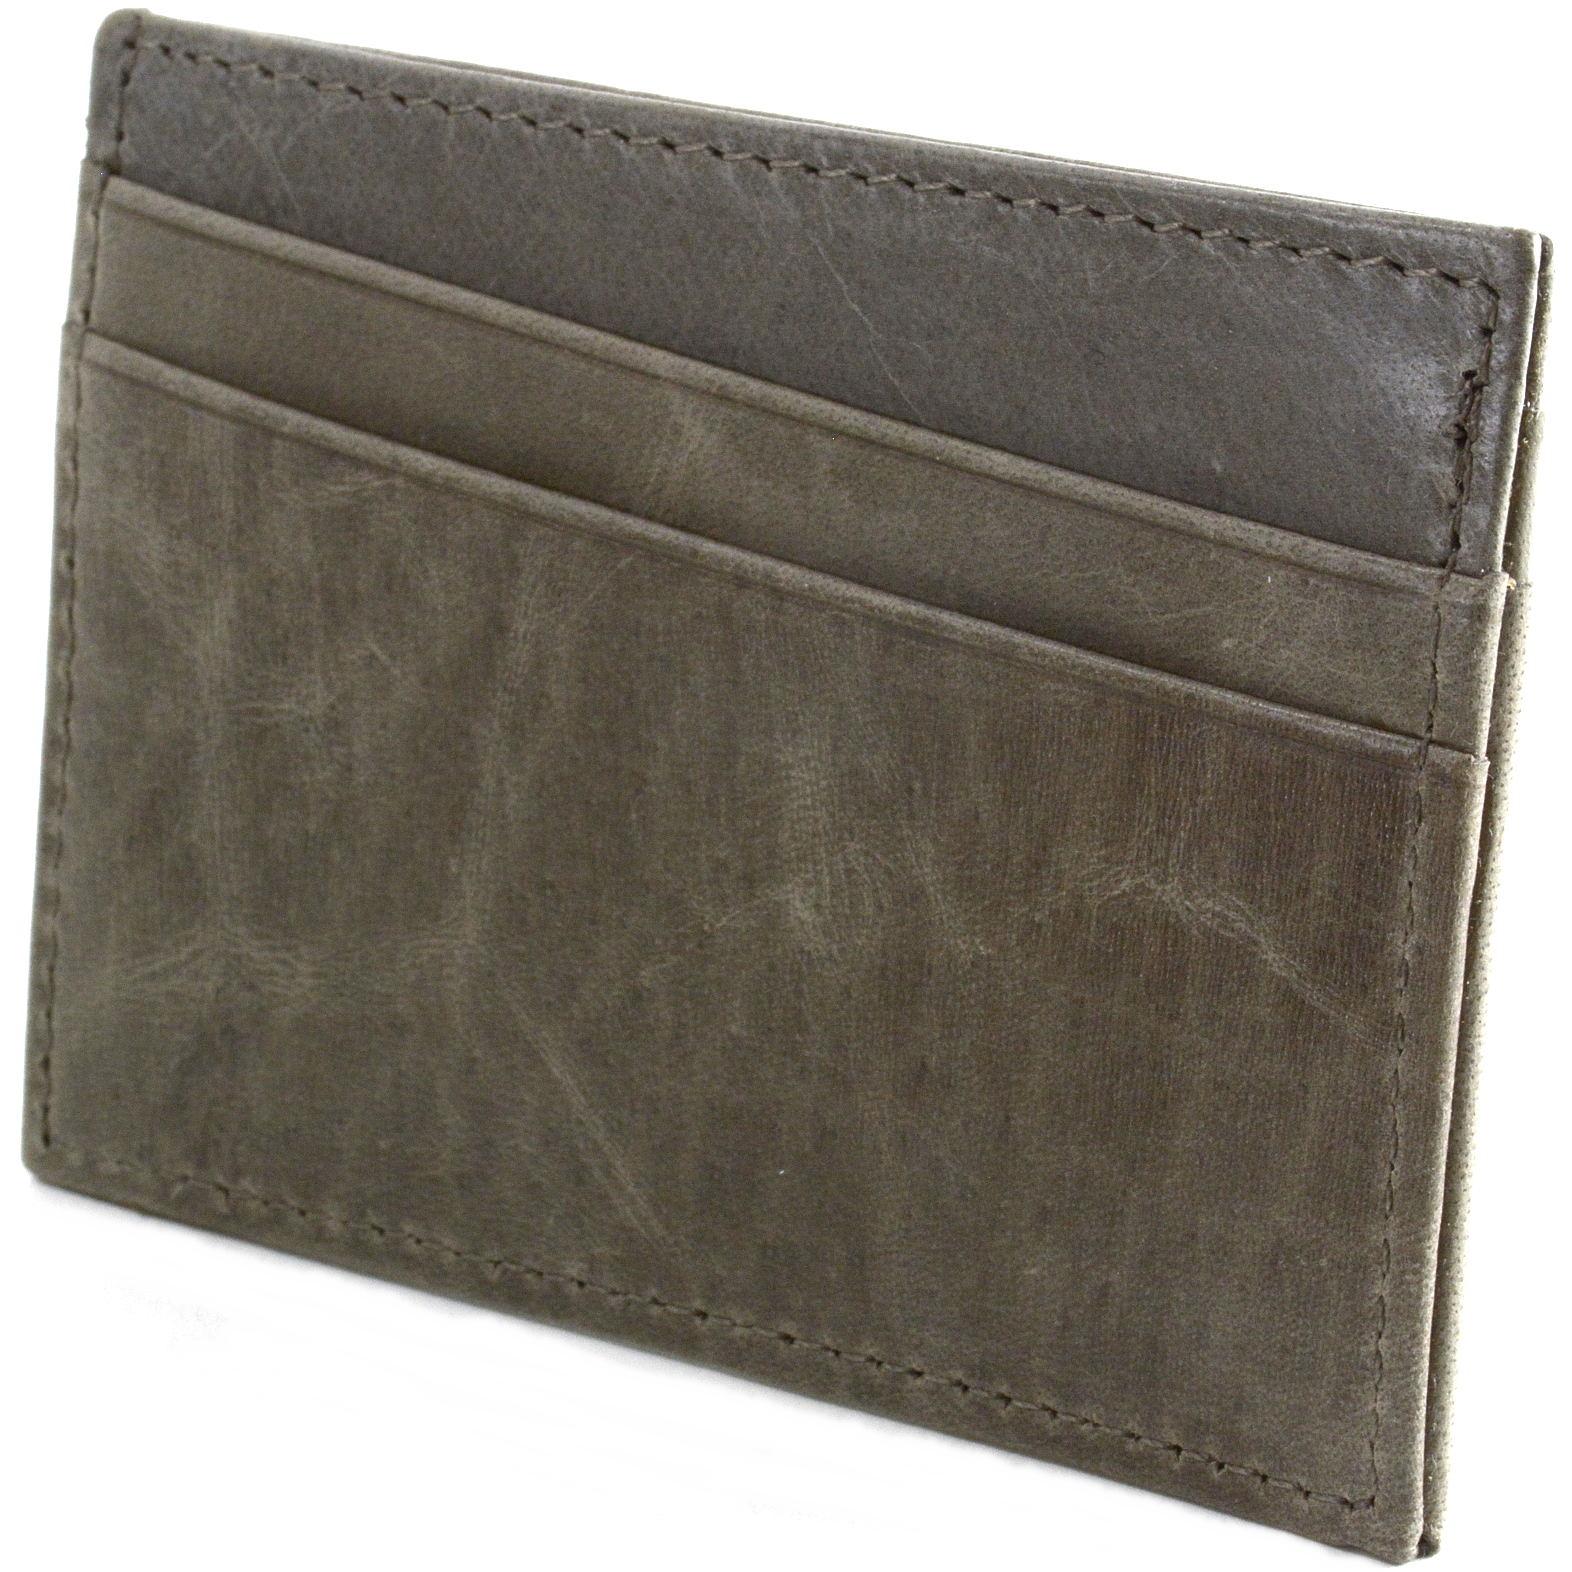 Alpine-Swiss-Minimalist-Leather-Front-Pocket-Wallet-5-Card-Slots-Slim-Thin-Case thumbnail 57